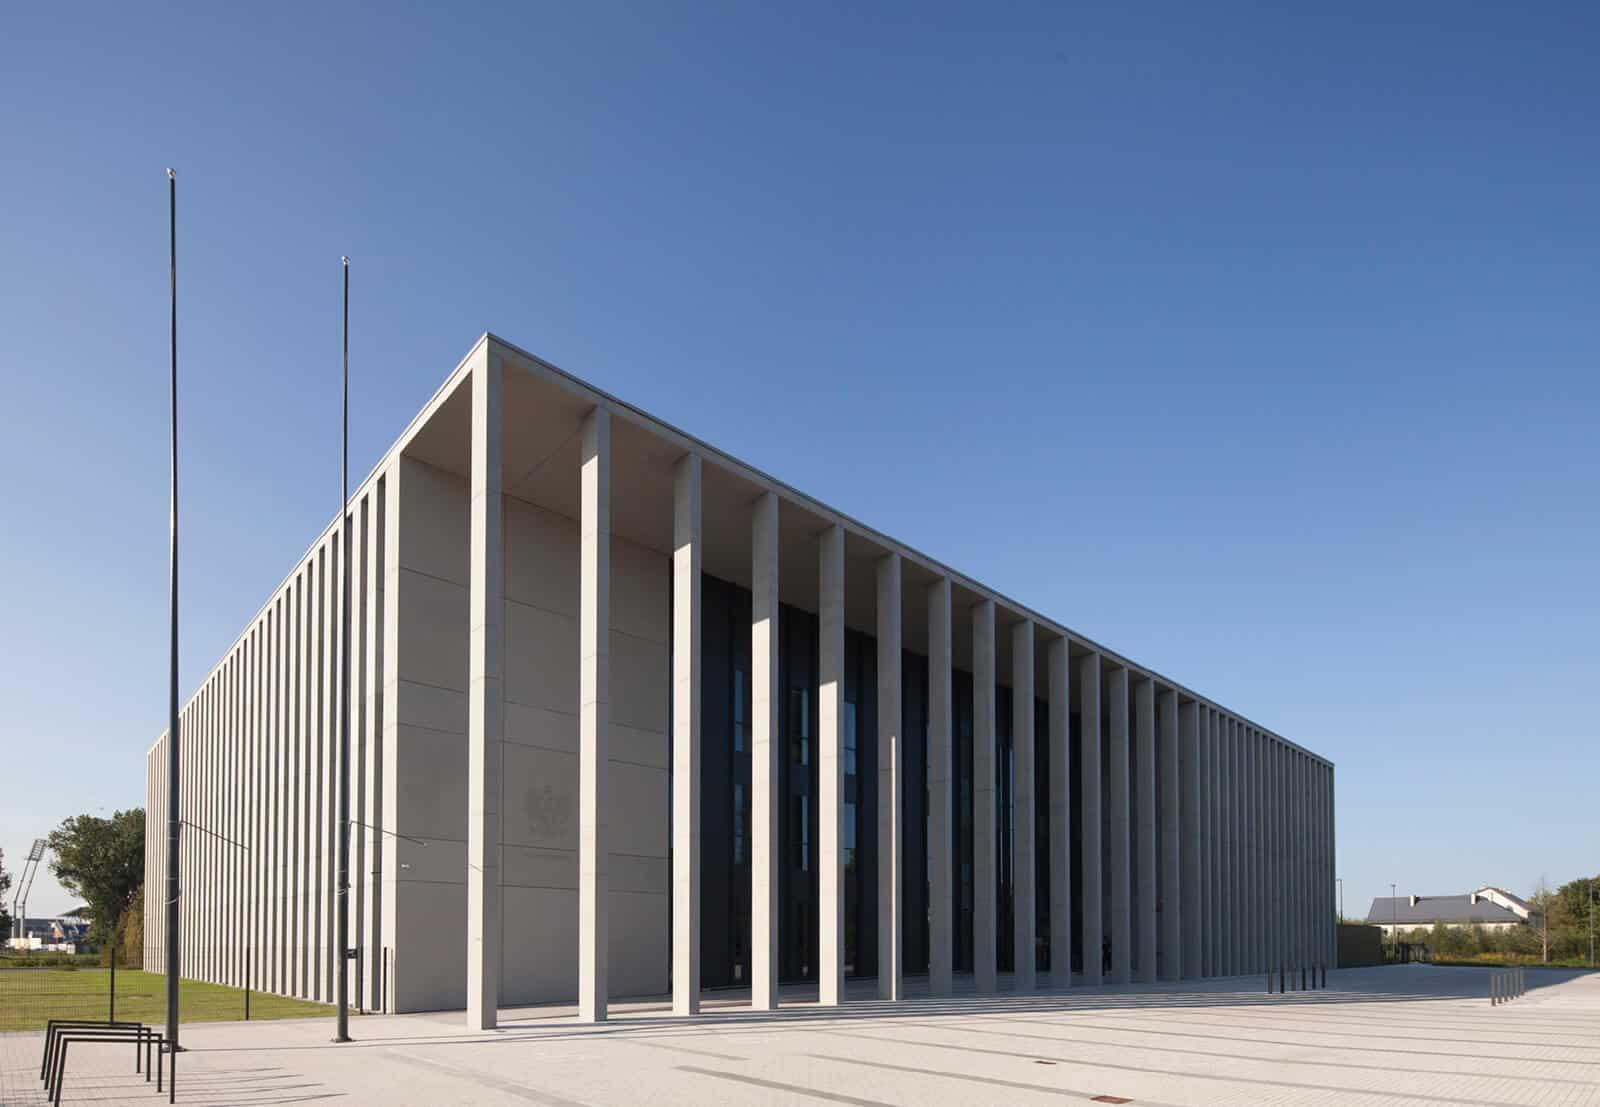 Regional Court Building Siedlce designed by HRA Architekci